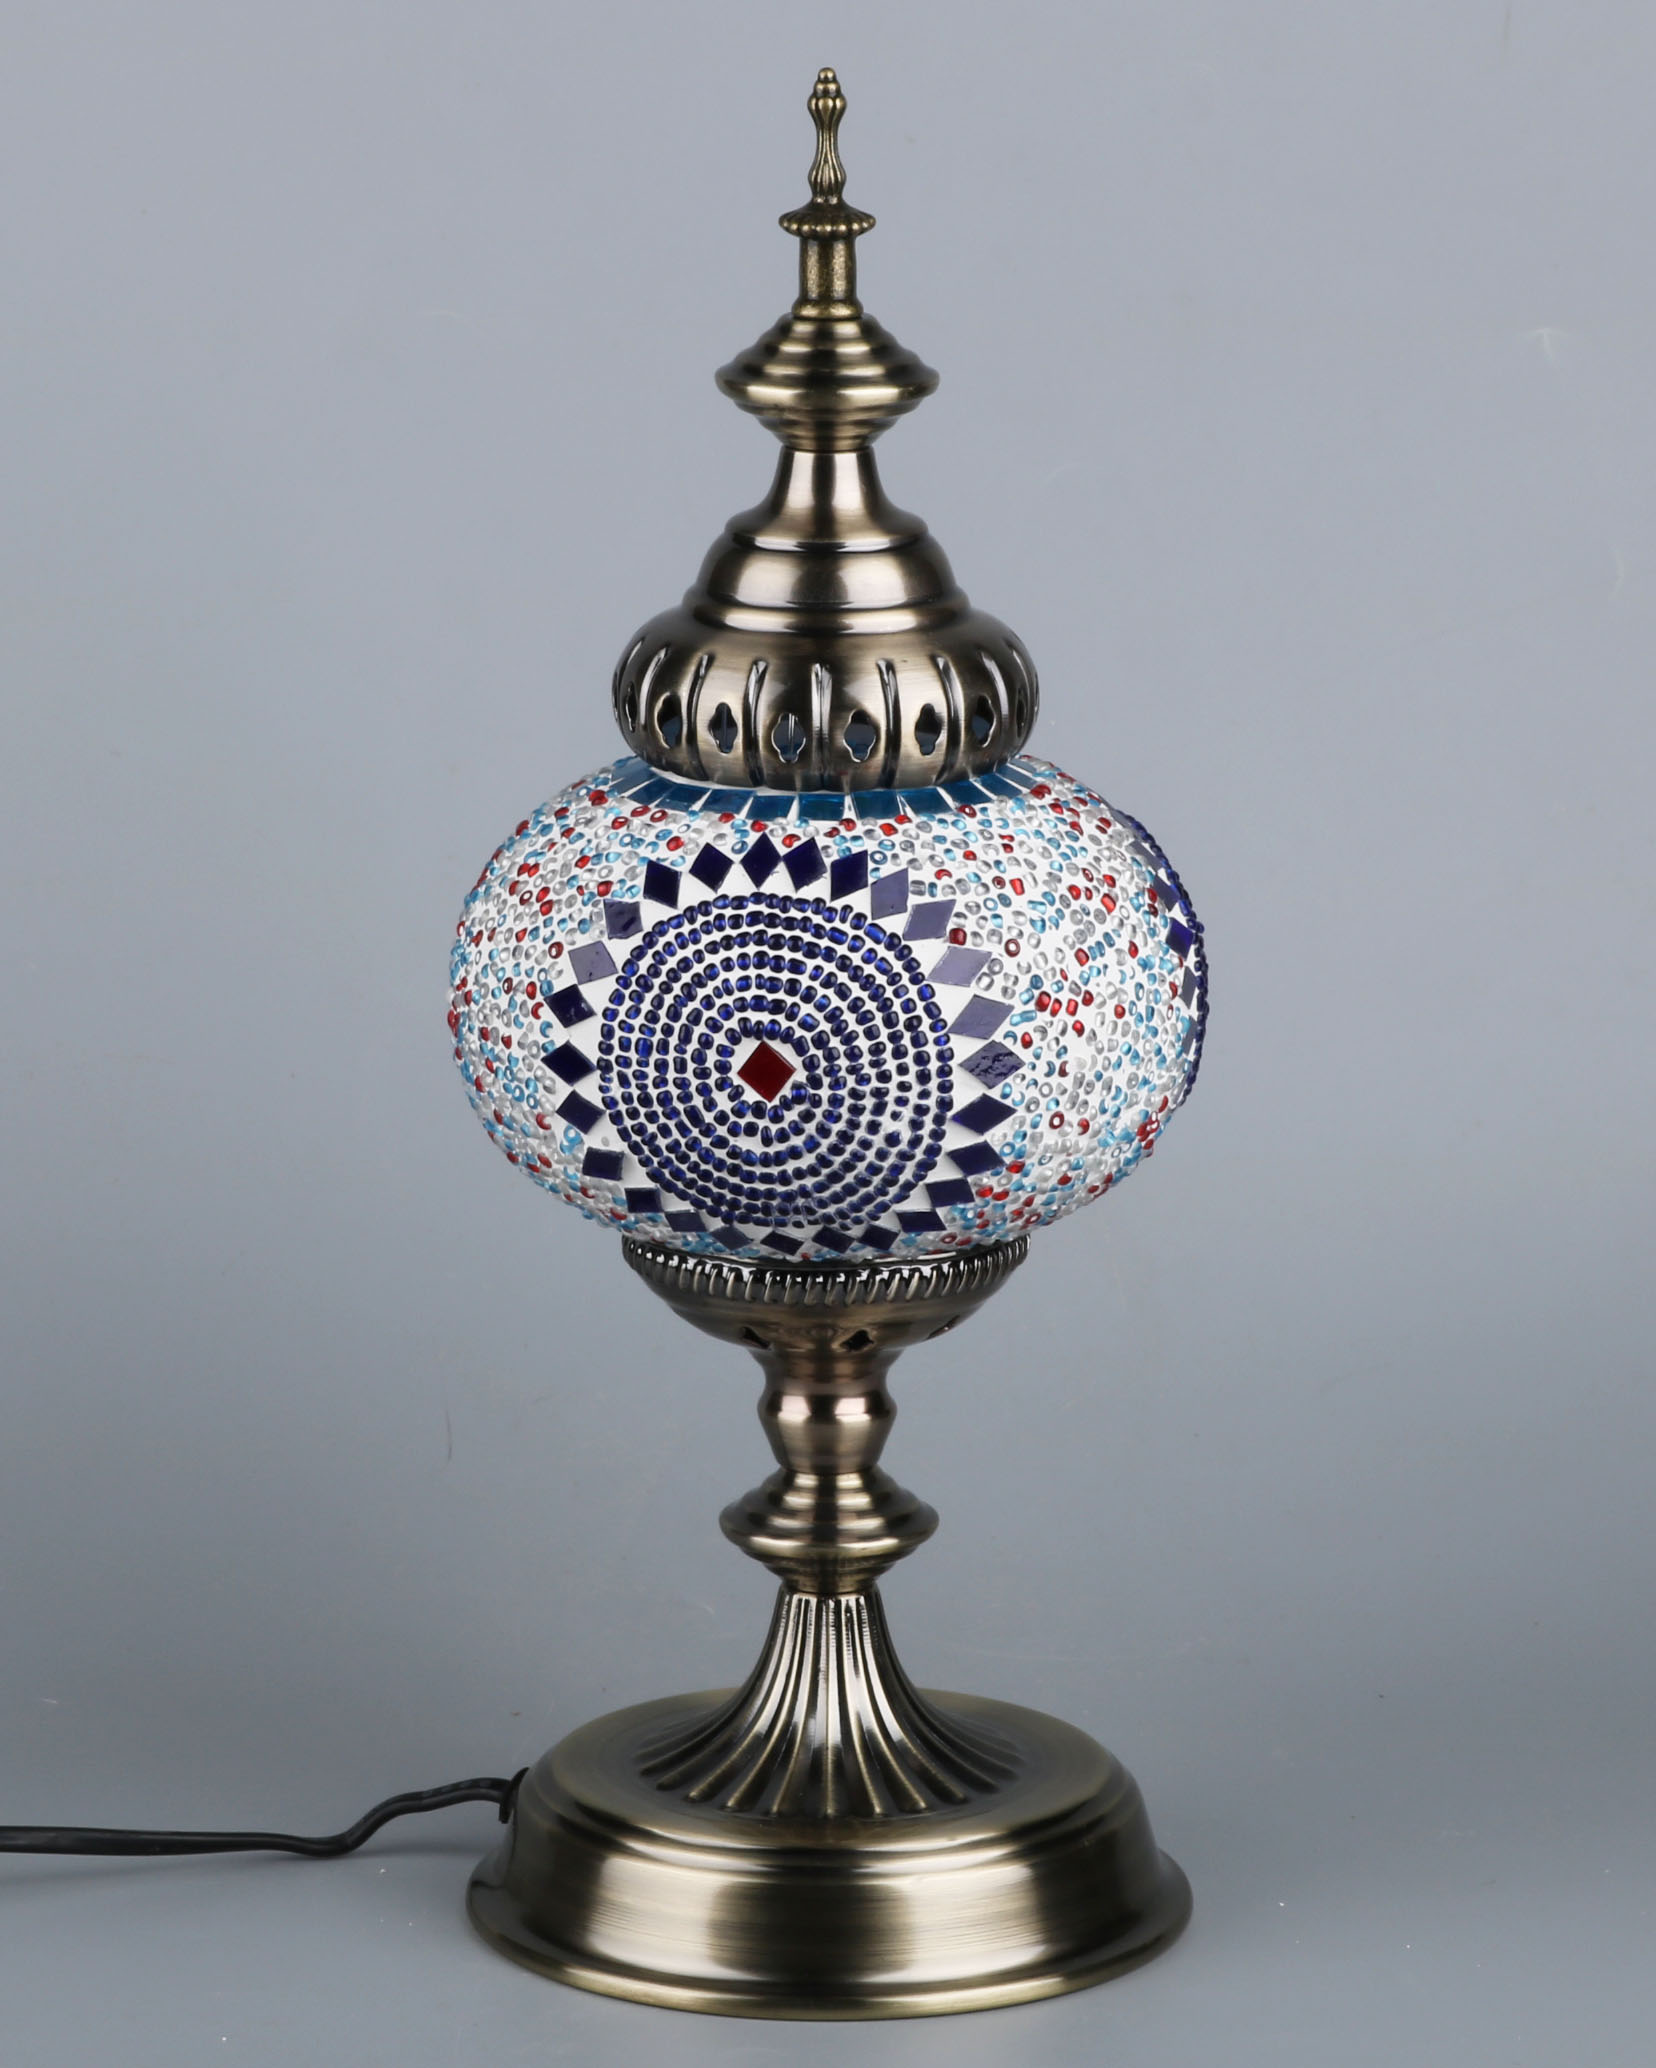 Exotic retro light restaurant cafe romantic Turkish Mosaic glass lights